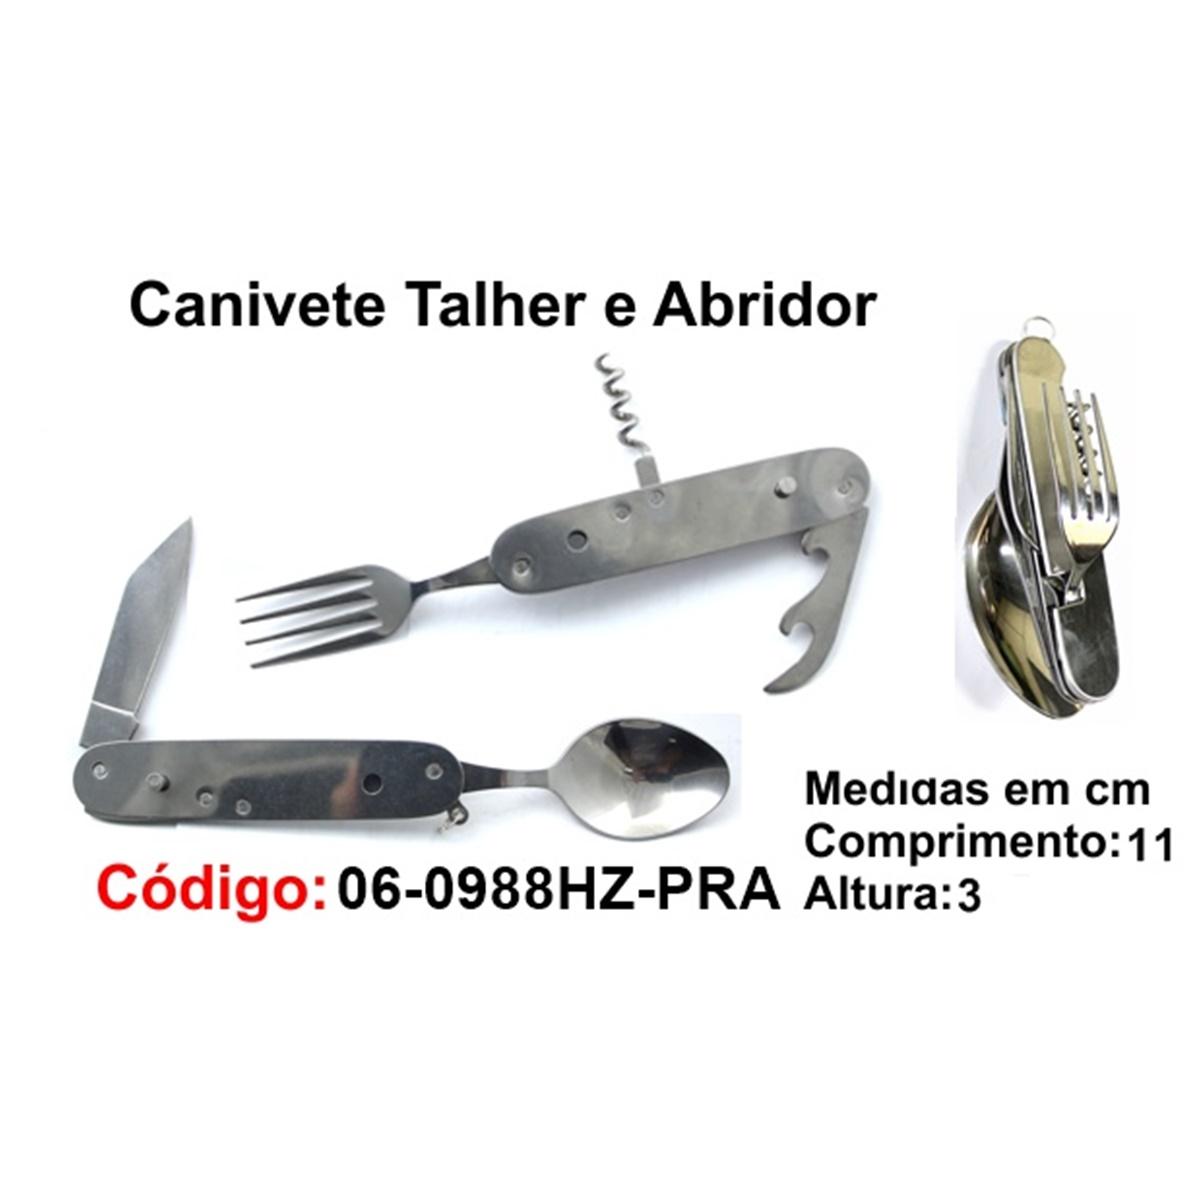 Canivete Talher Abridor Multiuso Caça Pesca Etc. 06-0988HZ-PRA